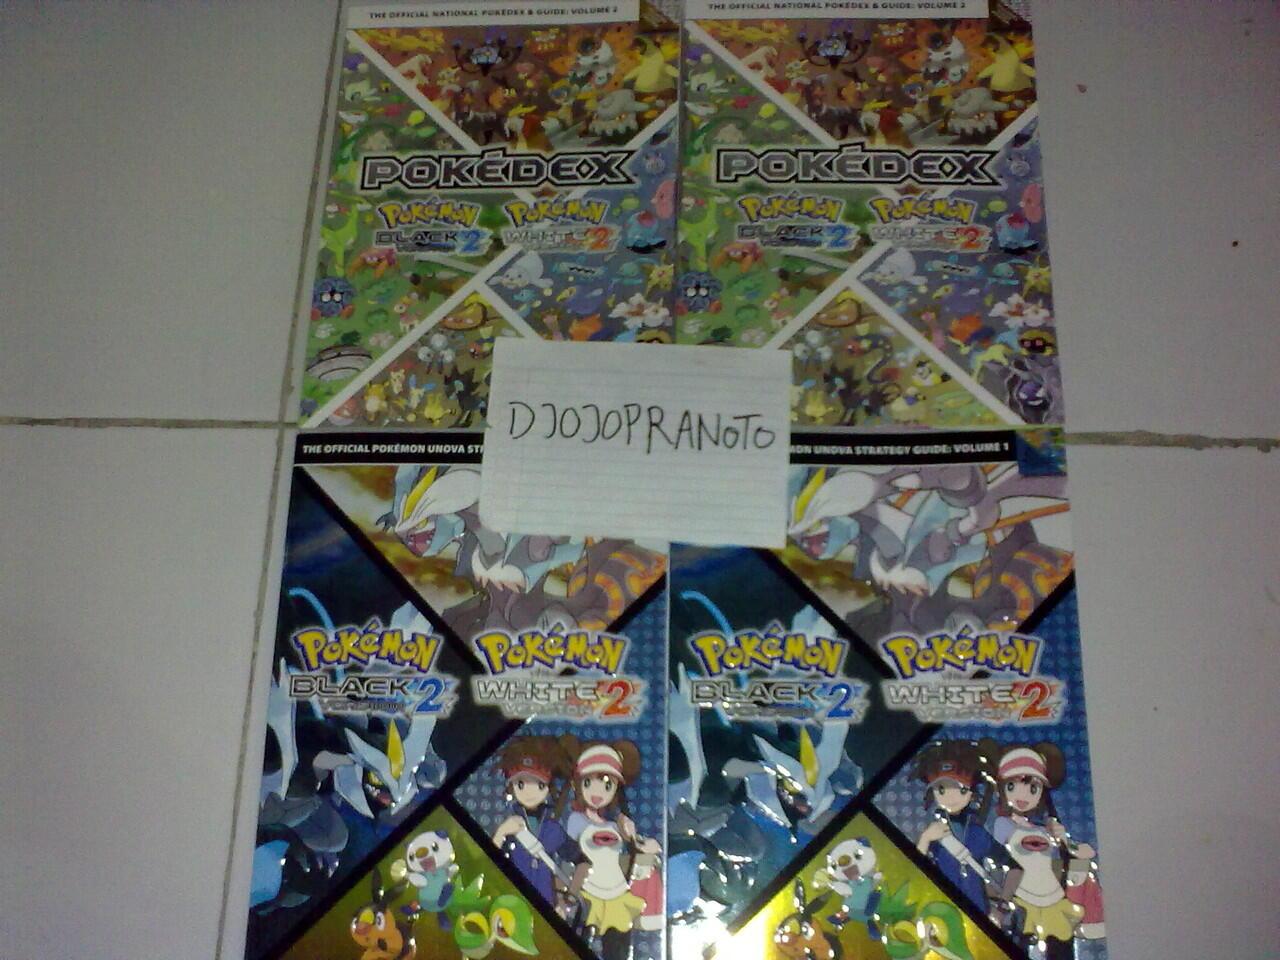 BNIB 3DS XL Pikachu Edition & Pokemon X &Y,Pokemon Black/White 2,Pokemon Mystery,Buku